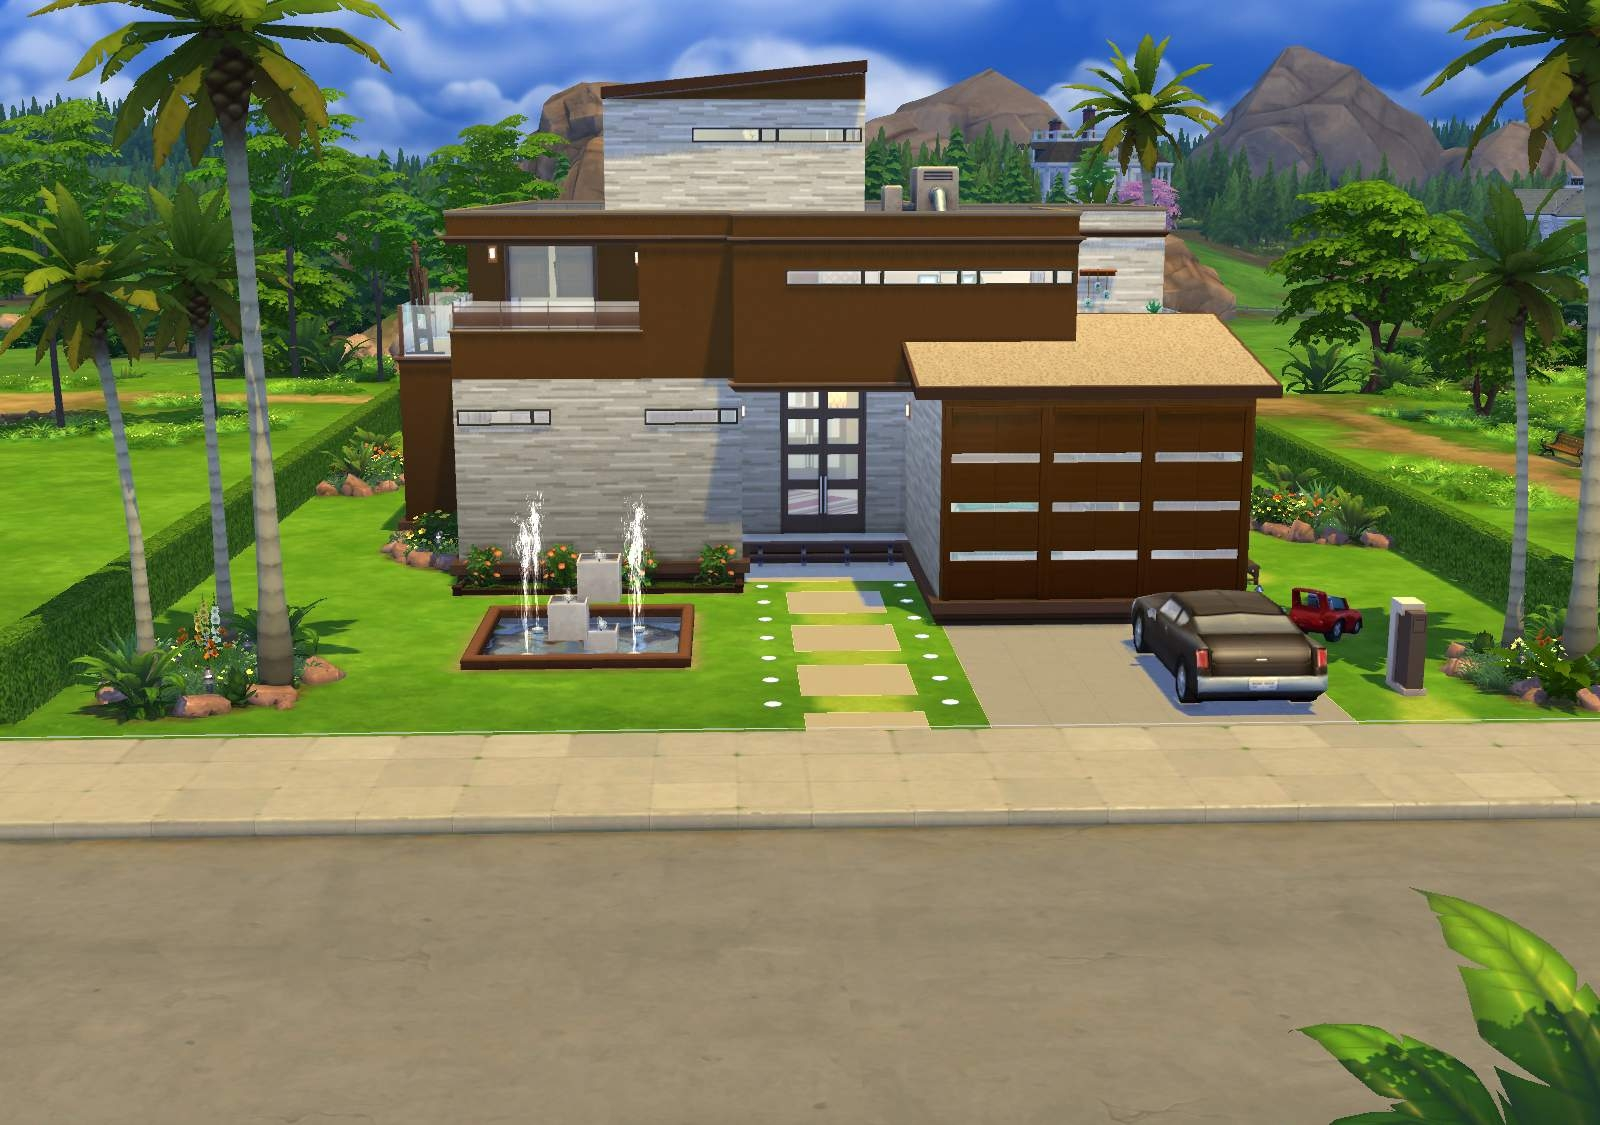 Concurso 06 junio 2016 la casa moderna inscripci n for Casa moderna los sims 3